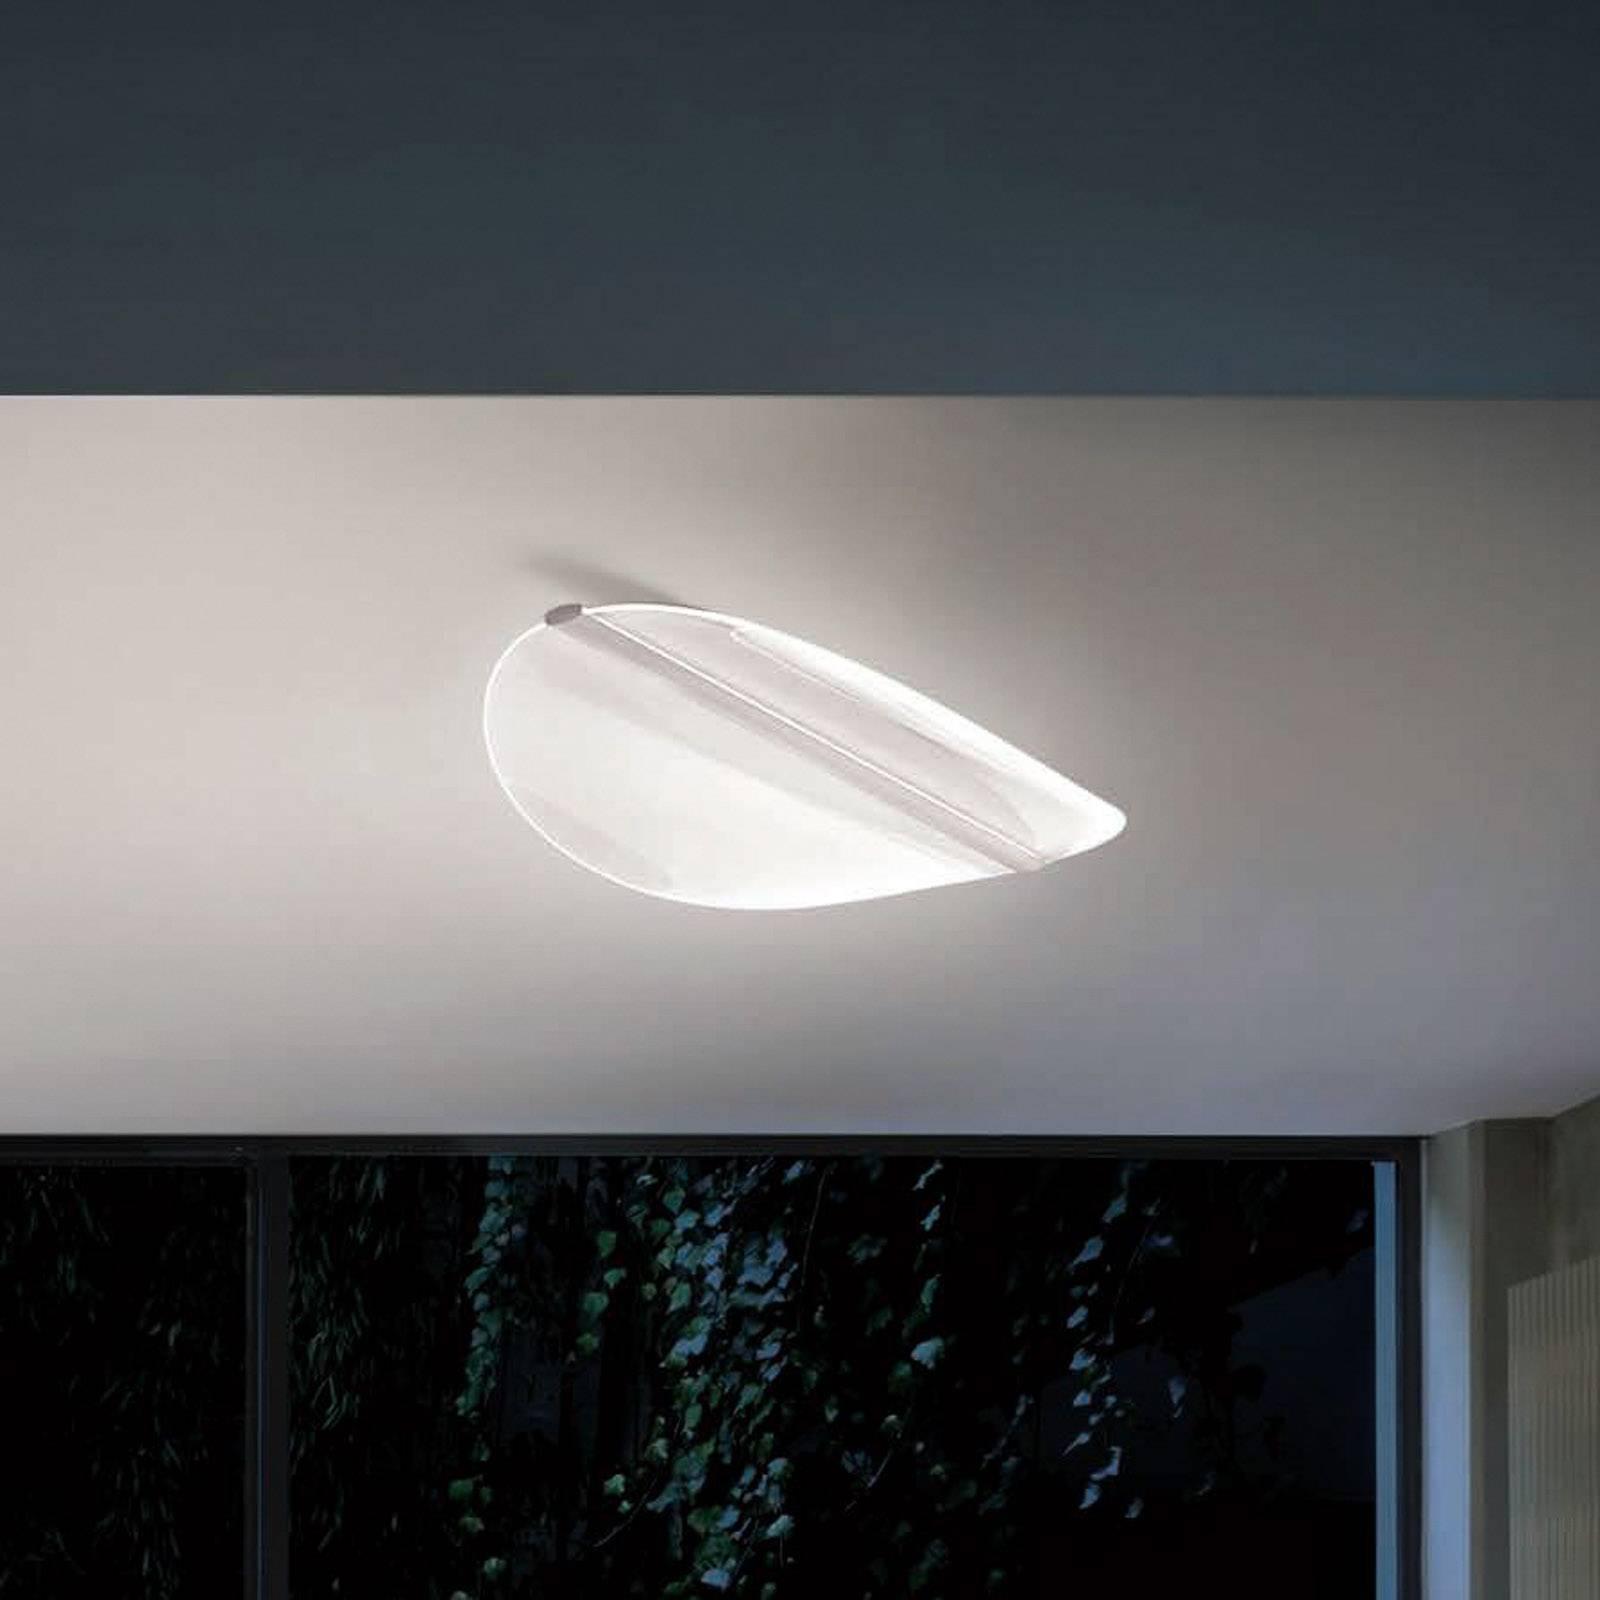 LED-Deckenleuchte Diphy, 54 cm